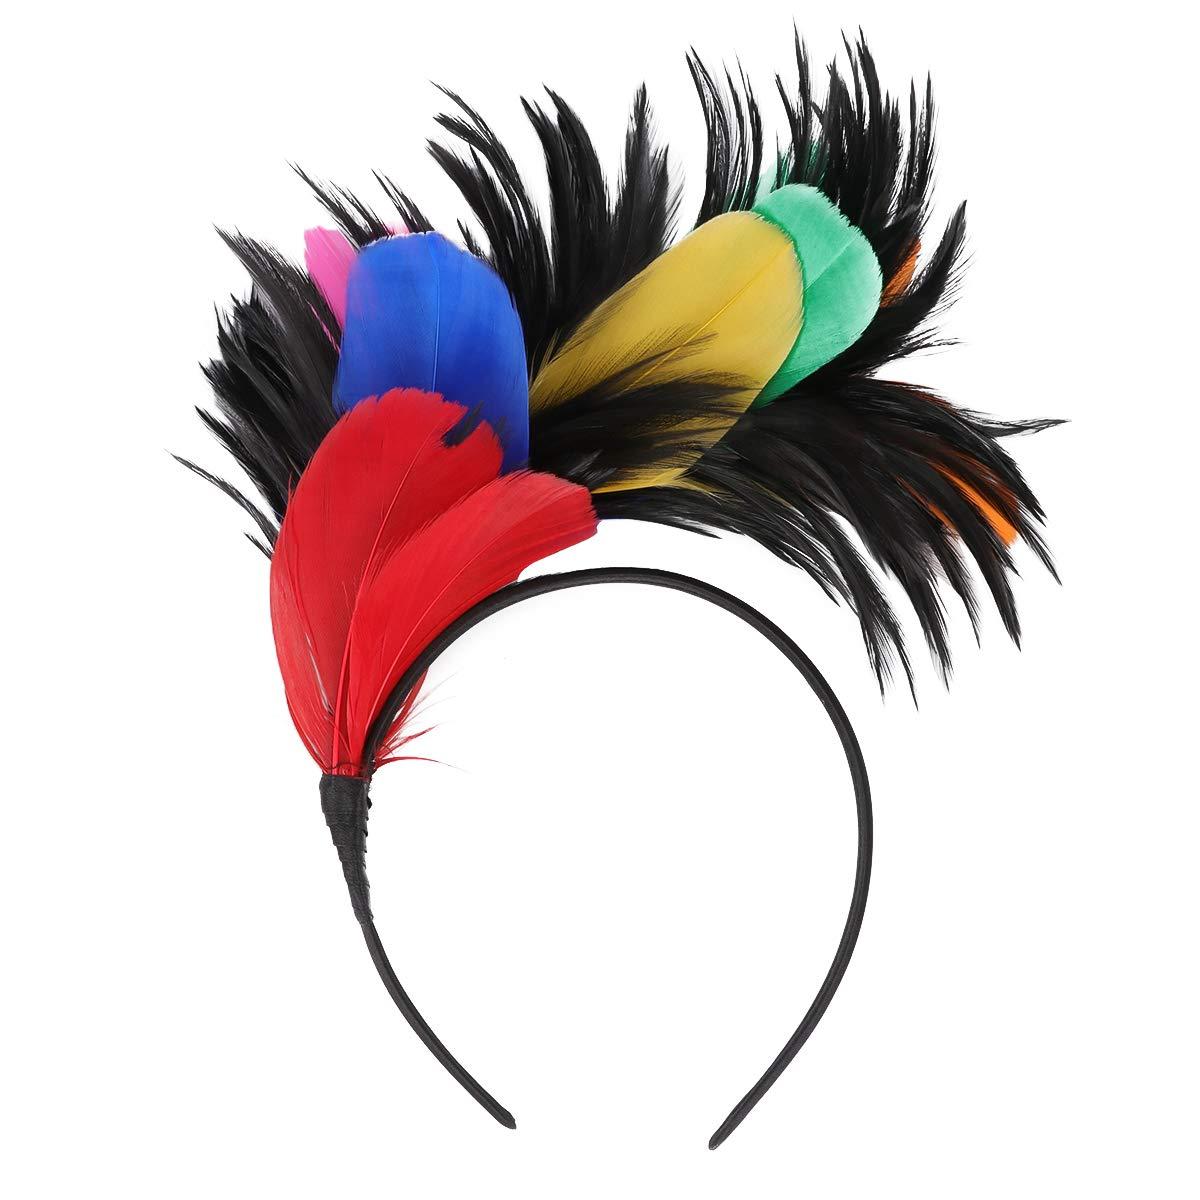 Uonlytech Fascinator Hair Hoop Feathers Headband Performance Hairband Masquerade Headwear